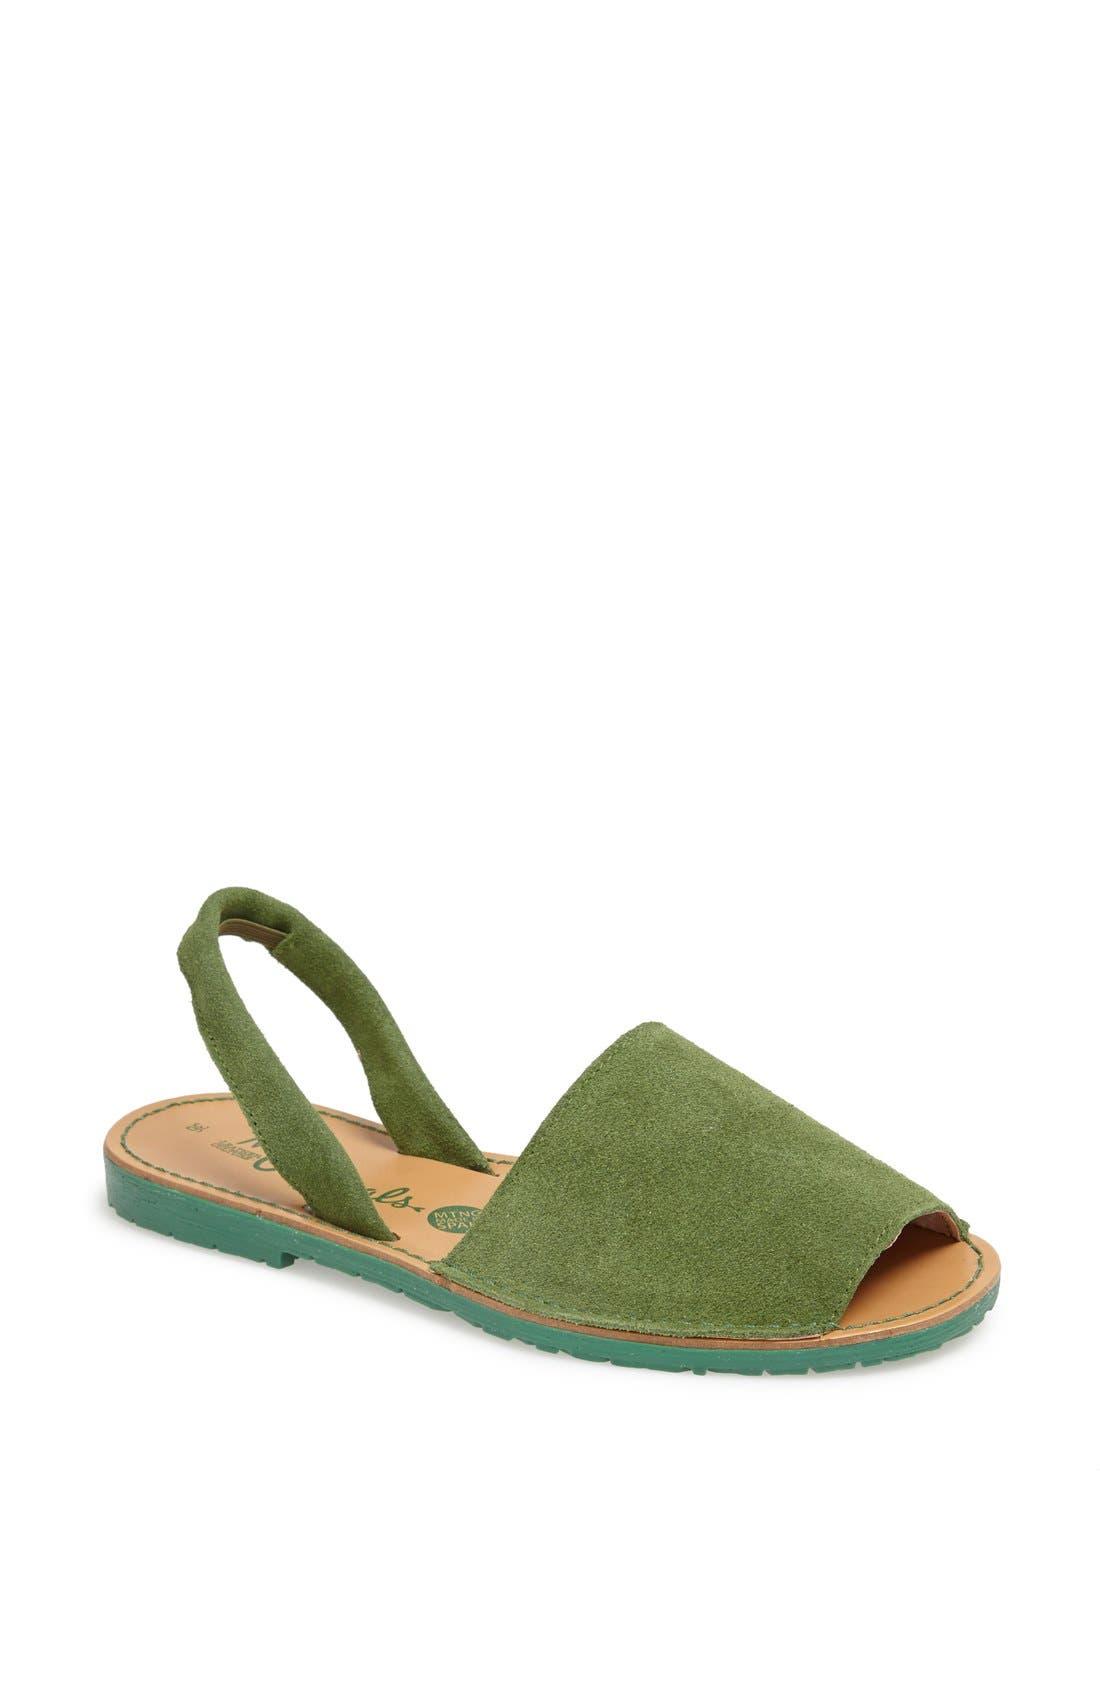 Main Image - MTNG Originals 'Tabar' Sandal